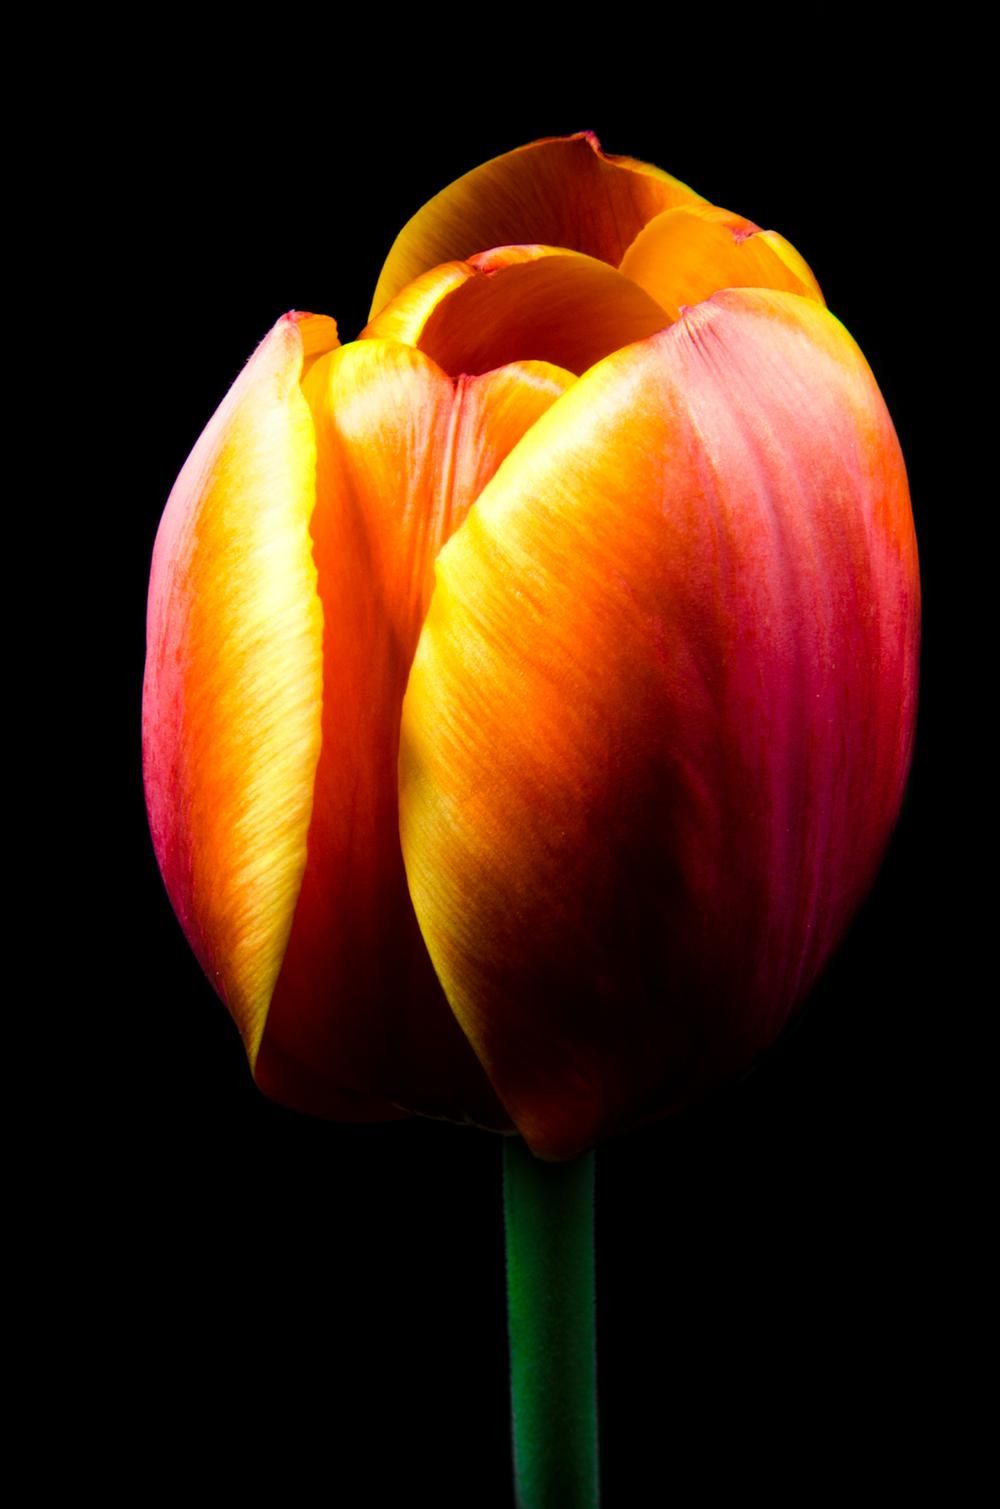 Project 365: #105 - Tulip